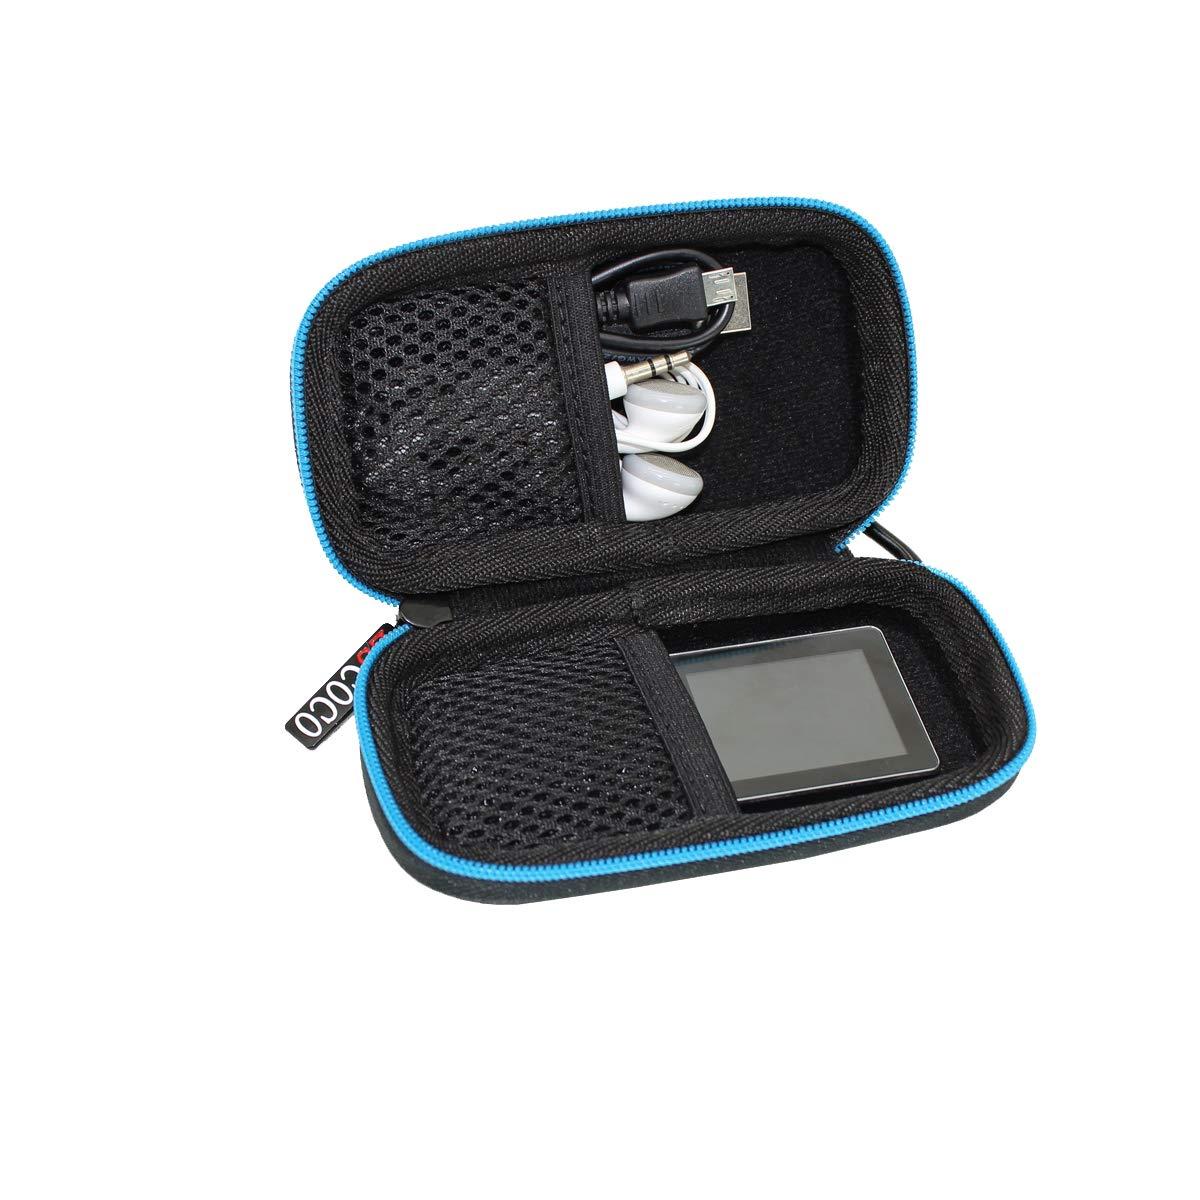 ESCOCO Duro Estuche Viajes Funda Bolso para Reproductor MP3//MP4 Bluetooth,para Reproductor Victure//Soulcker//Svmuu//FITFORT//SUPEREYE MP3 Player